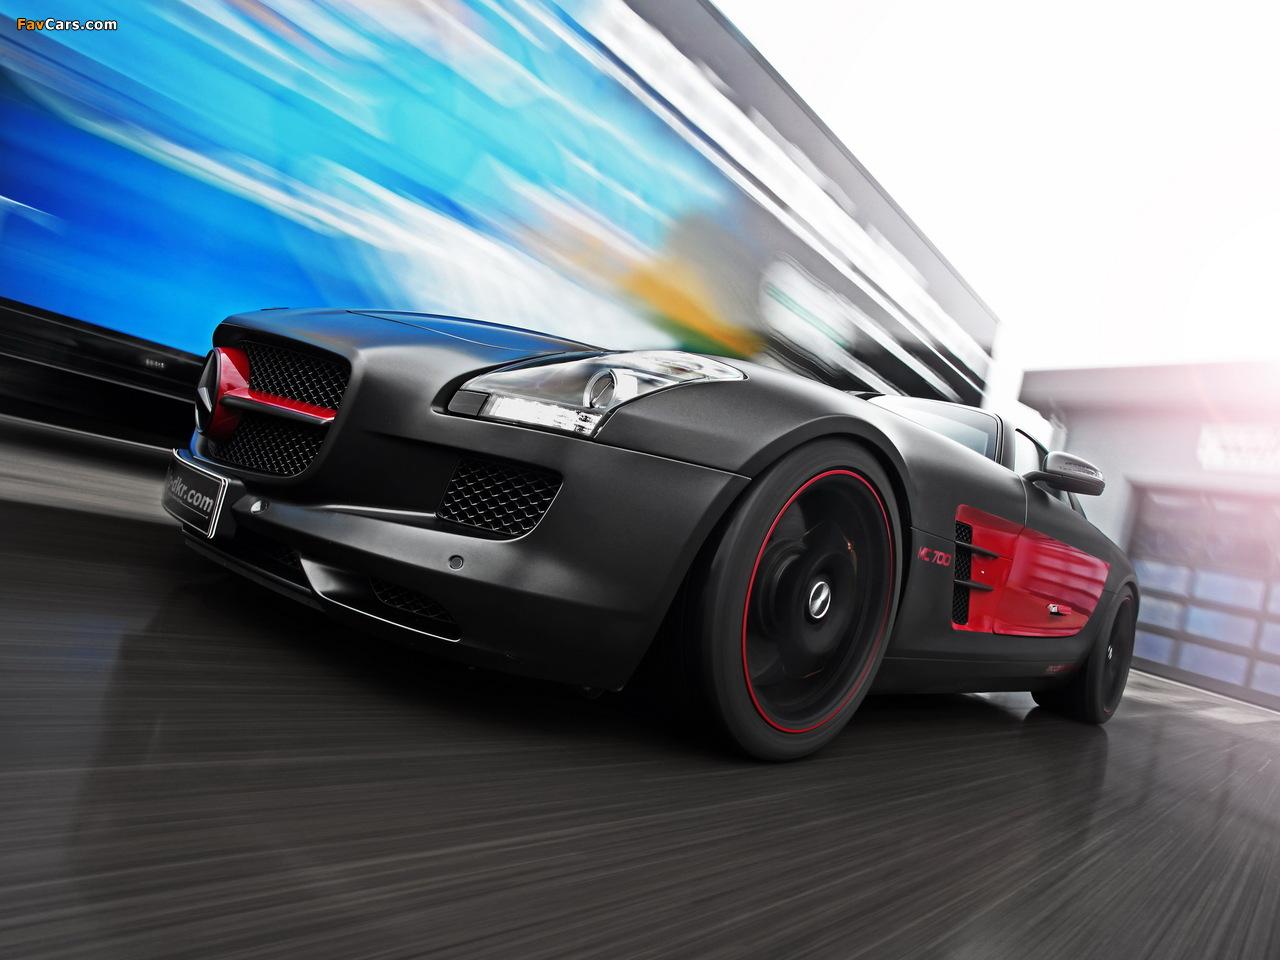 Mcchip-DKR Mercedes-Benz SLS 63 AMG MC 700 (C197) 2012 wallpapers (1280 x 960)